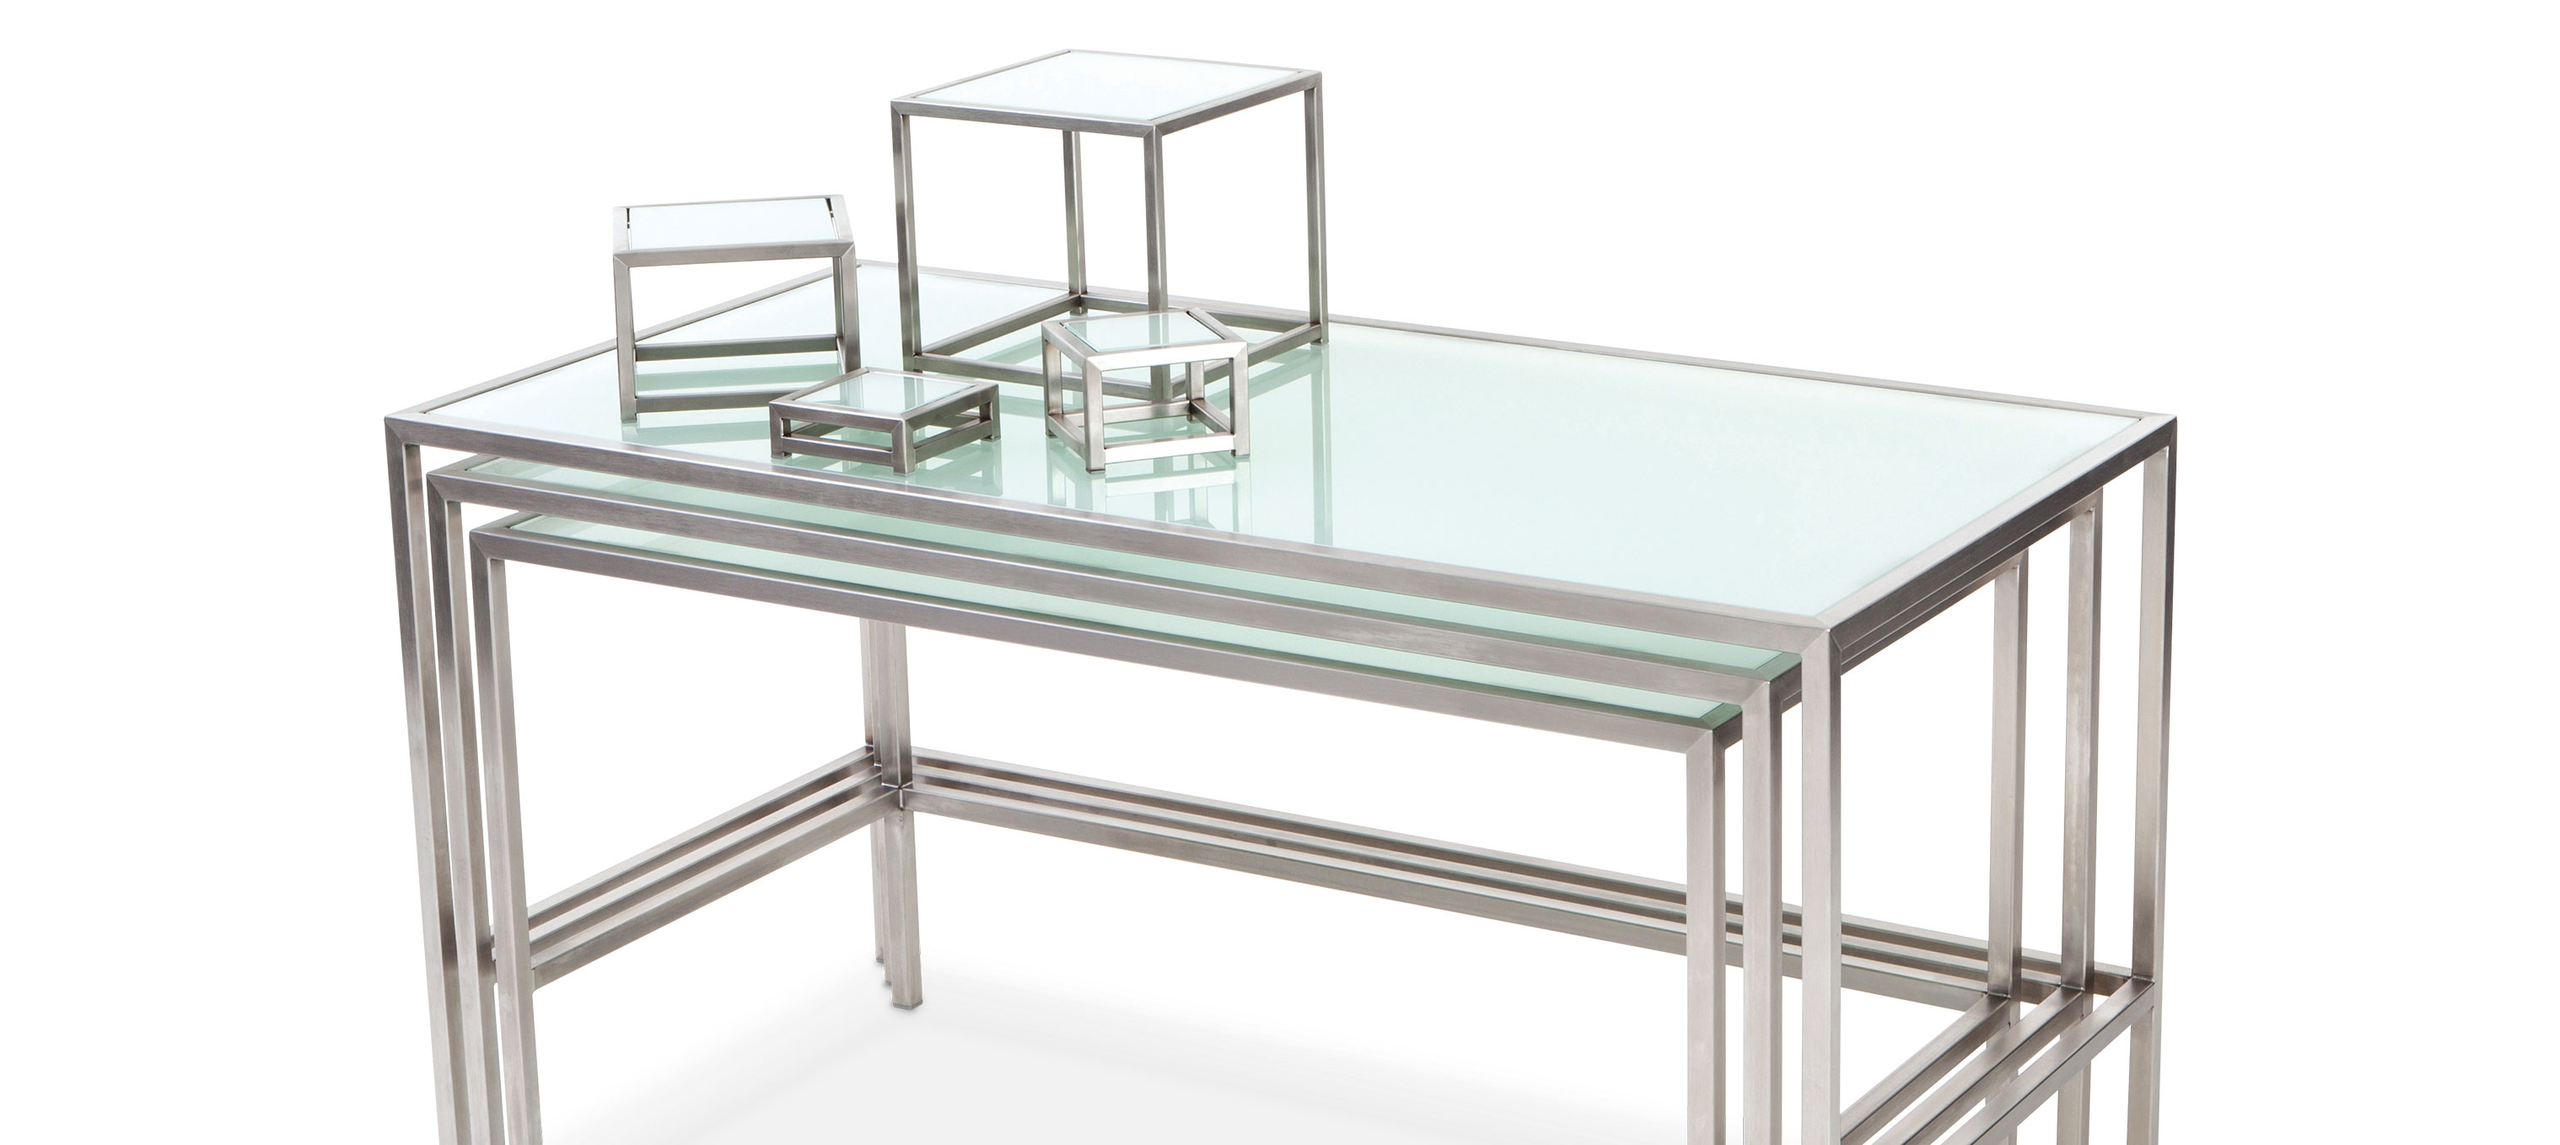 Steel & Style Buffet Table Hero Shot_2